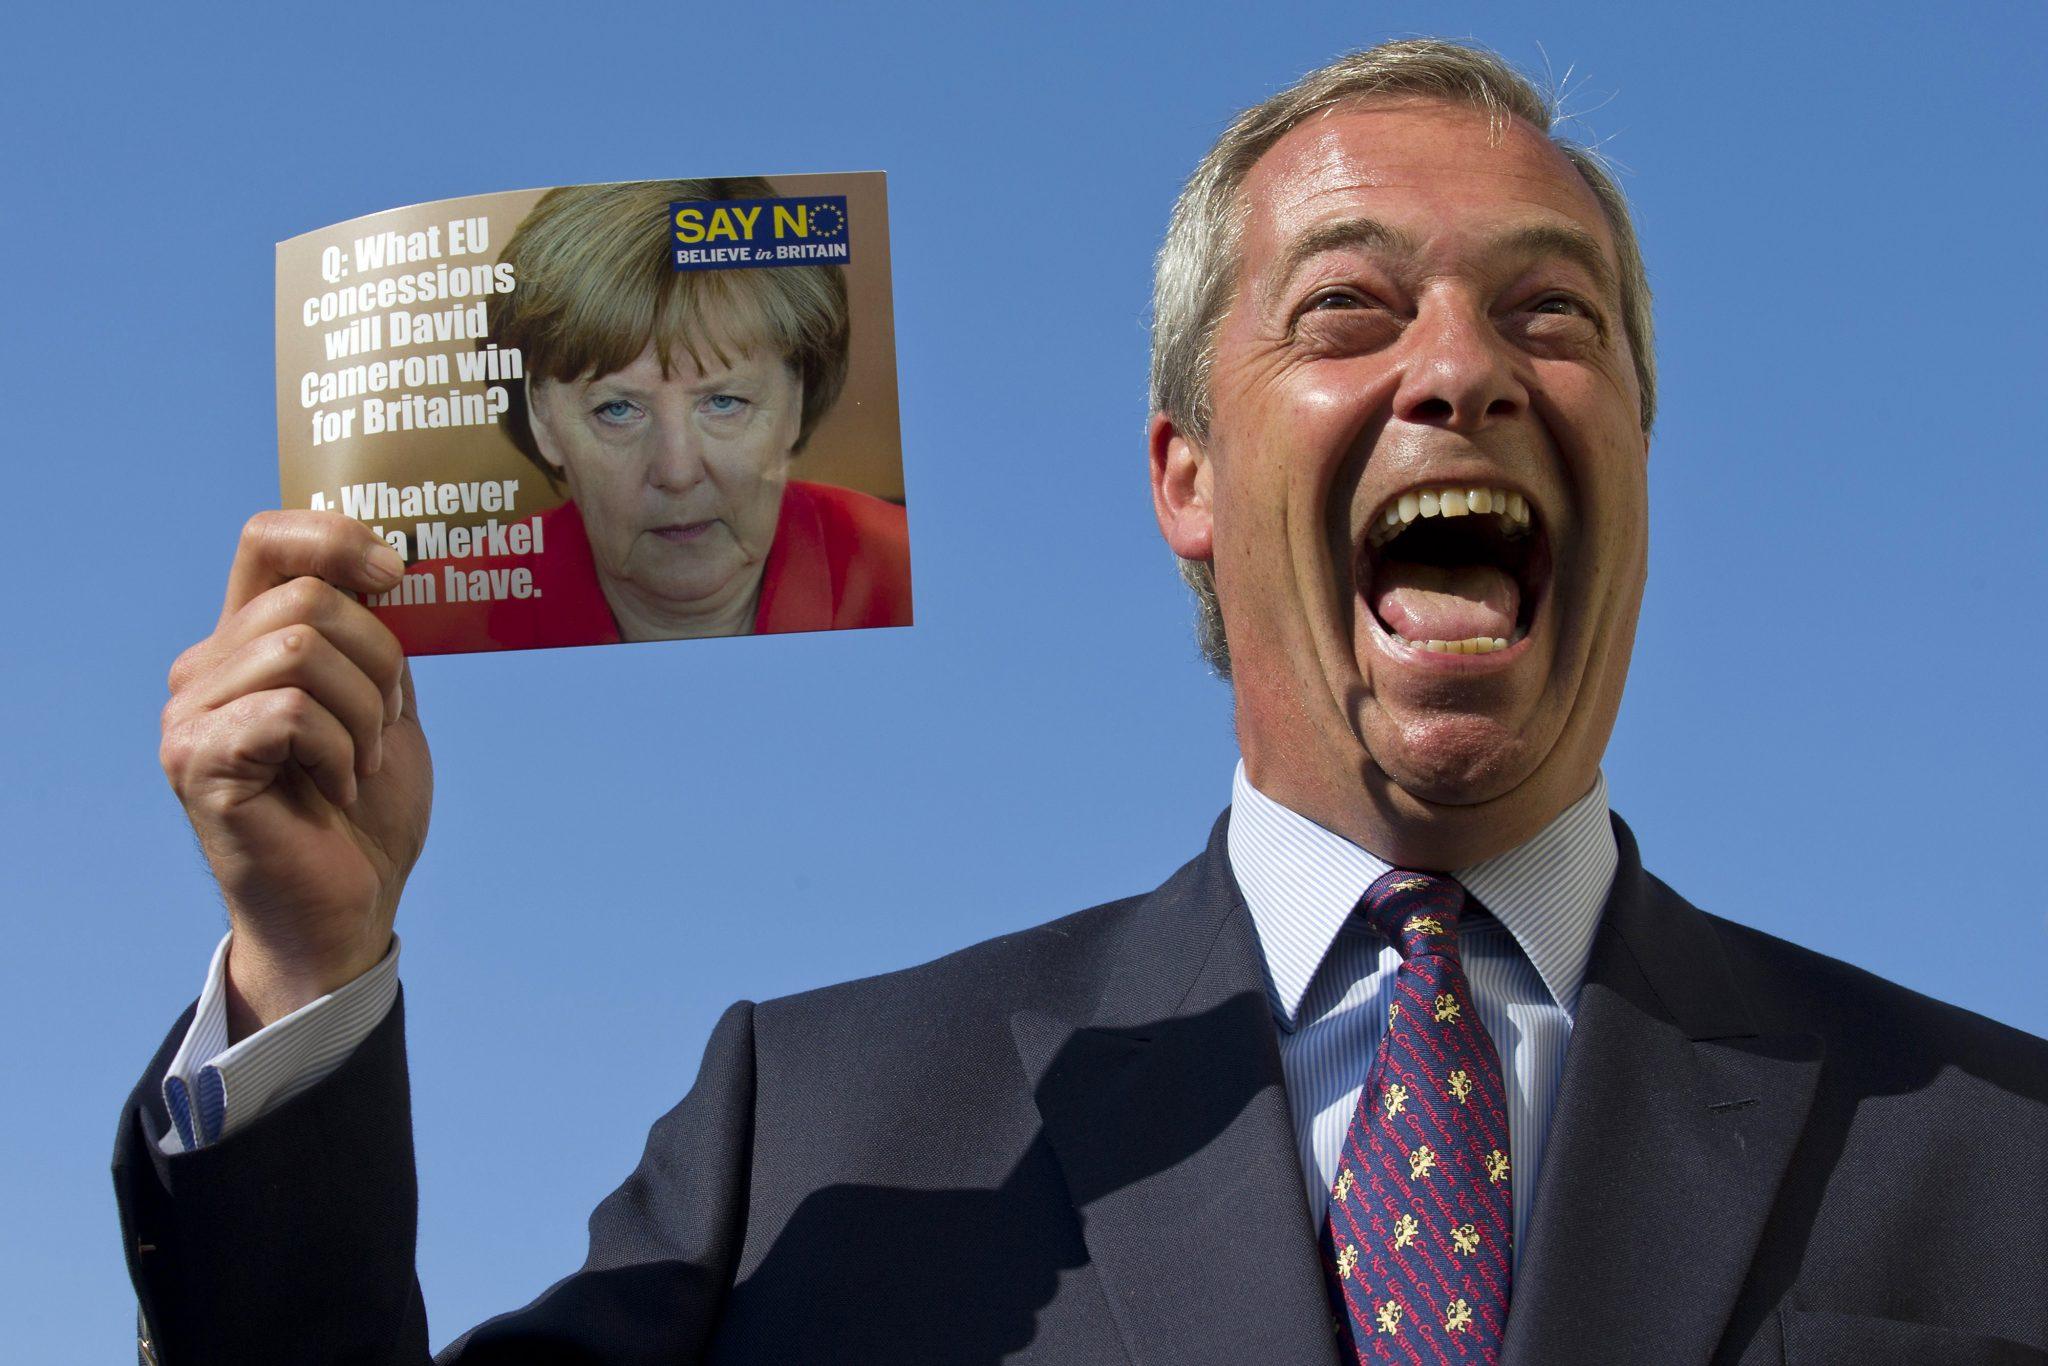 BRITAIN-POLITICS-UKIP-EU